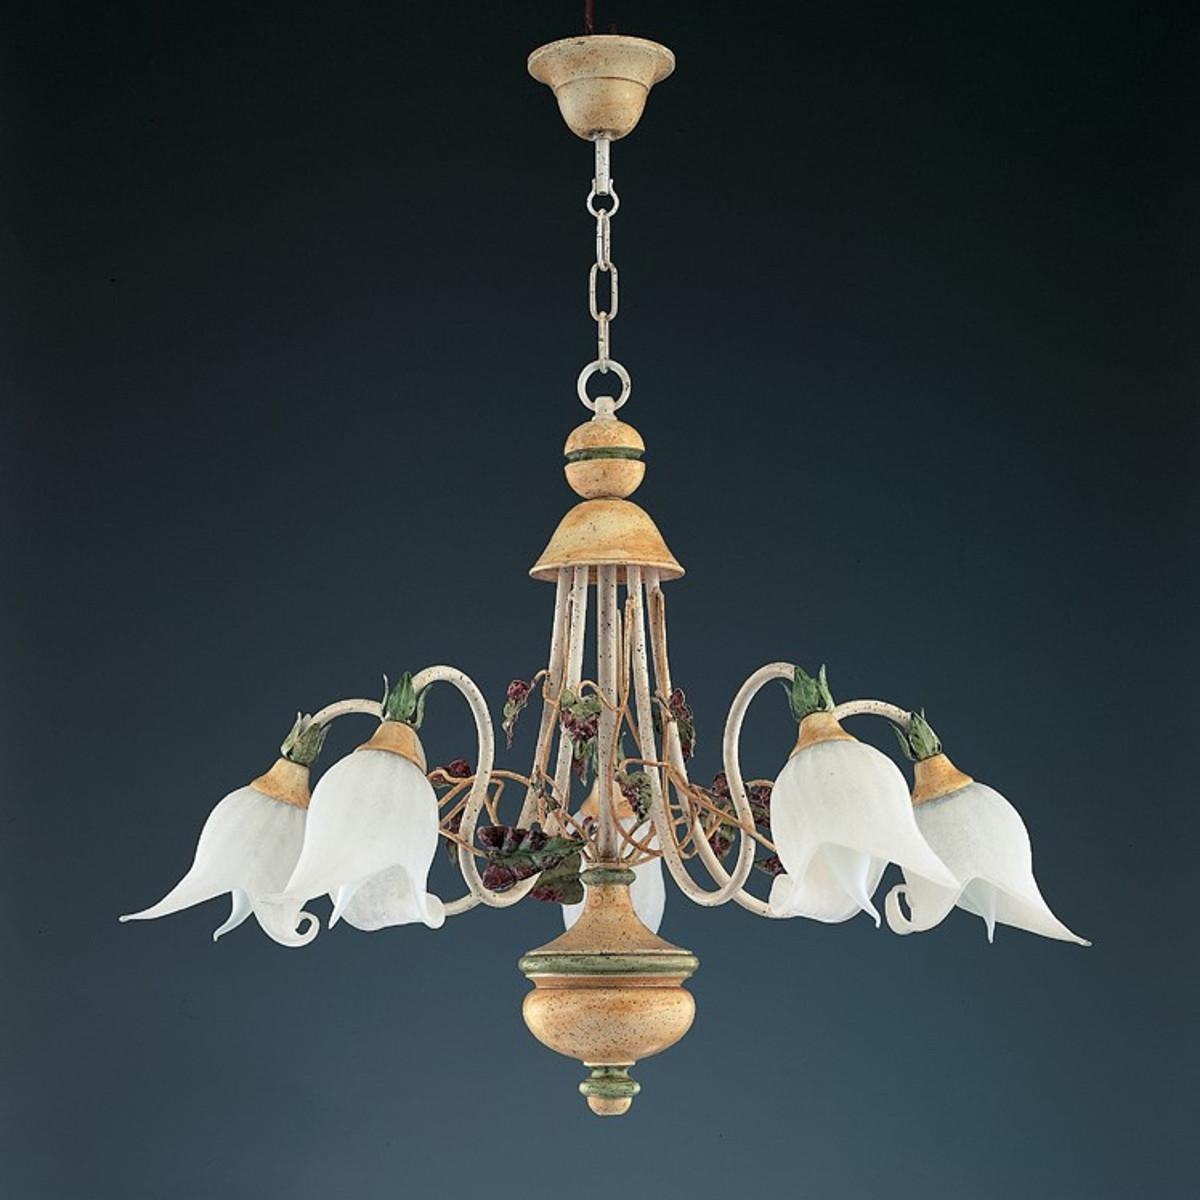 Florenz' Lamp